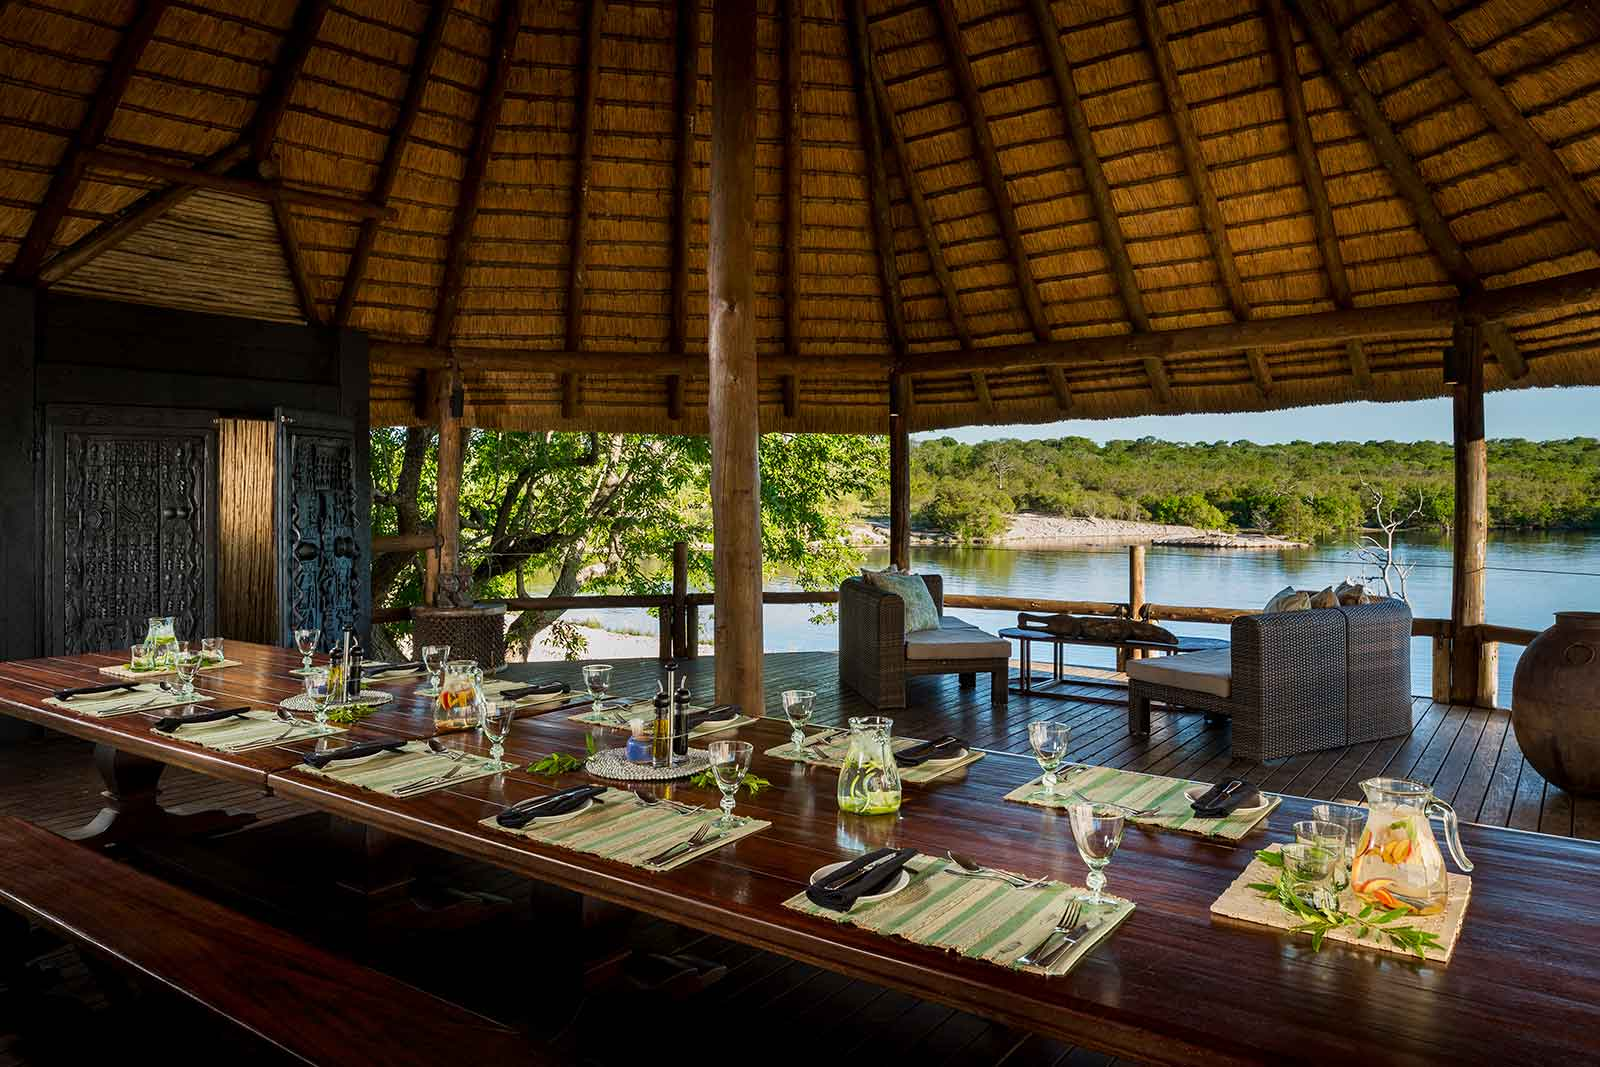 Camp Life at Ulusaba Safari Lodge